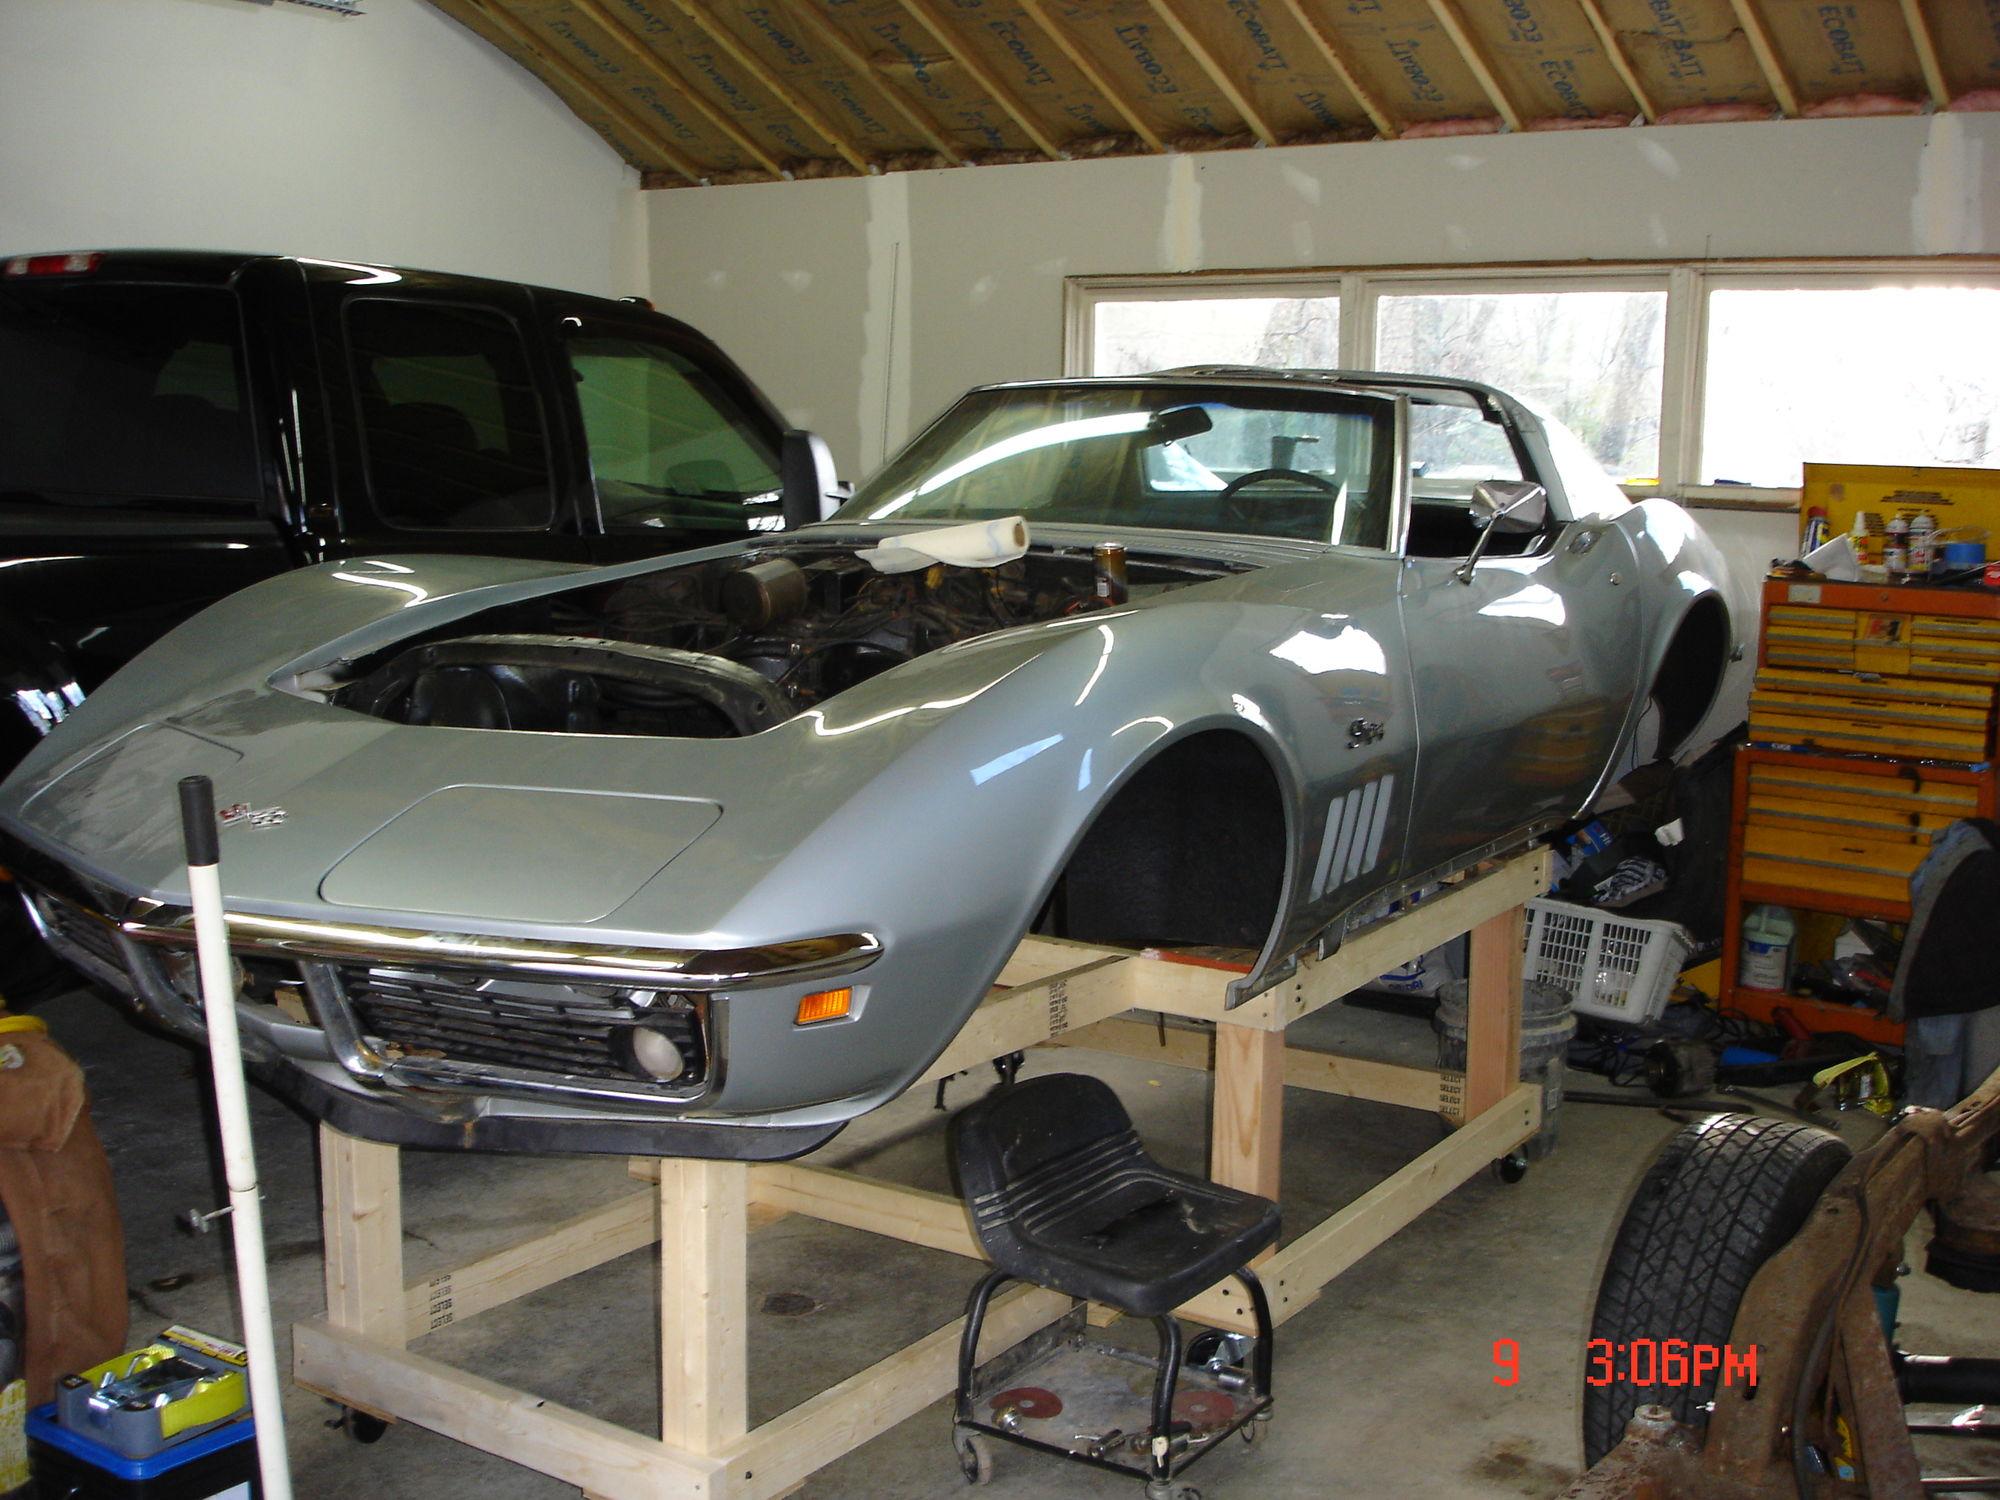 New Smyrna Chevrolet >> Chazde3's '68 Vette Project - Page 10 - CorvetteForum - Chevrolet Corvette Forum Discussion